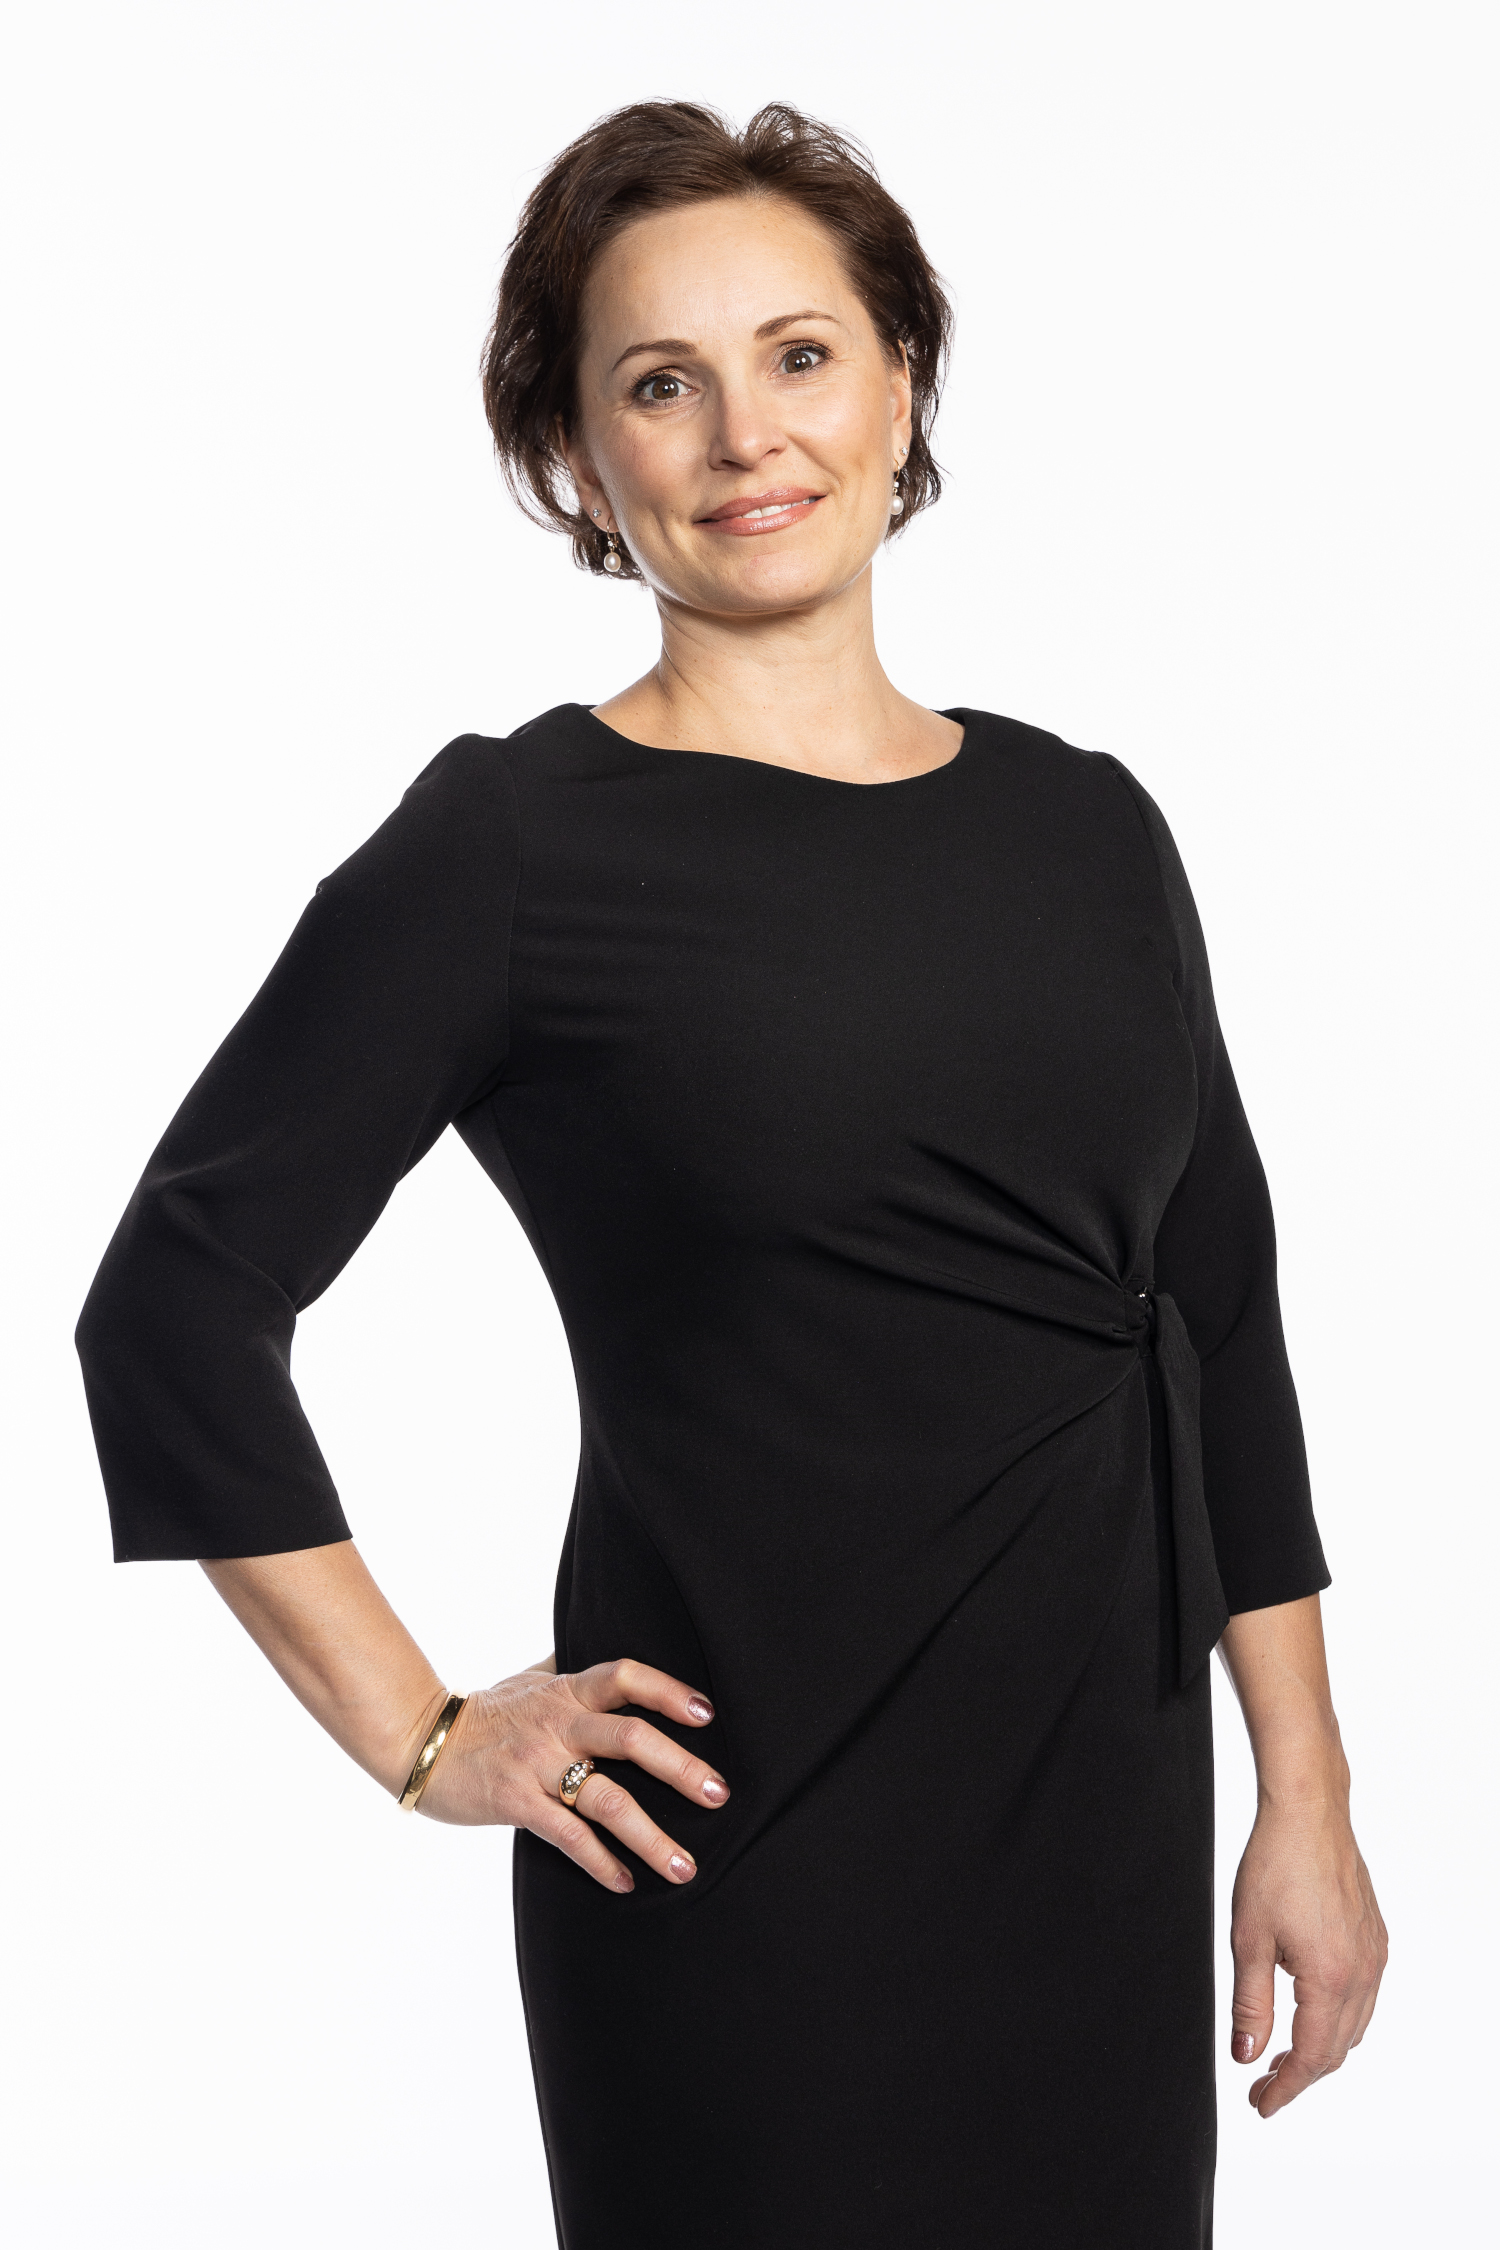 Maria Rautanen